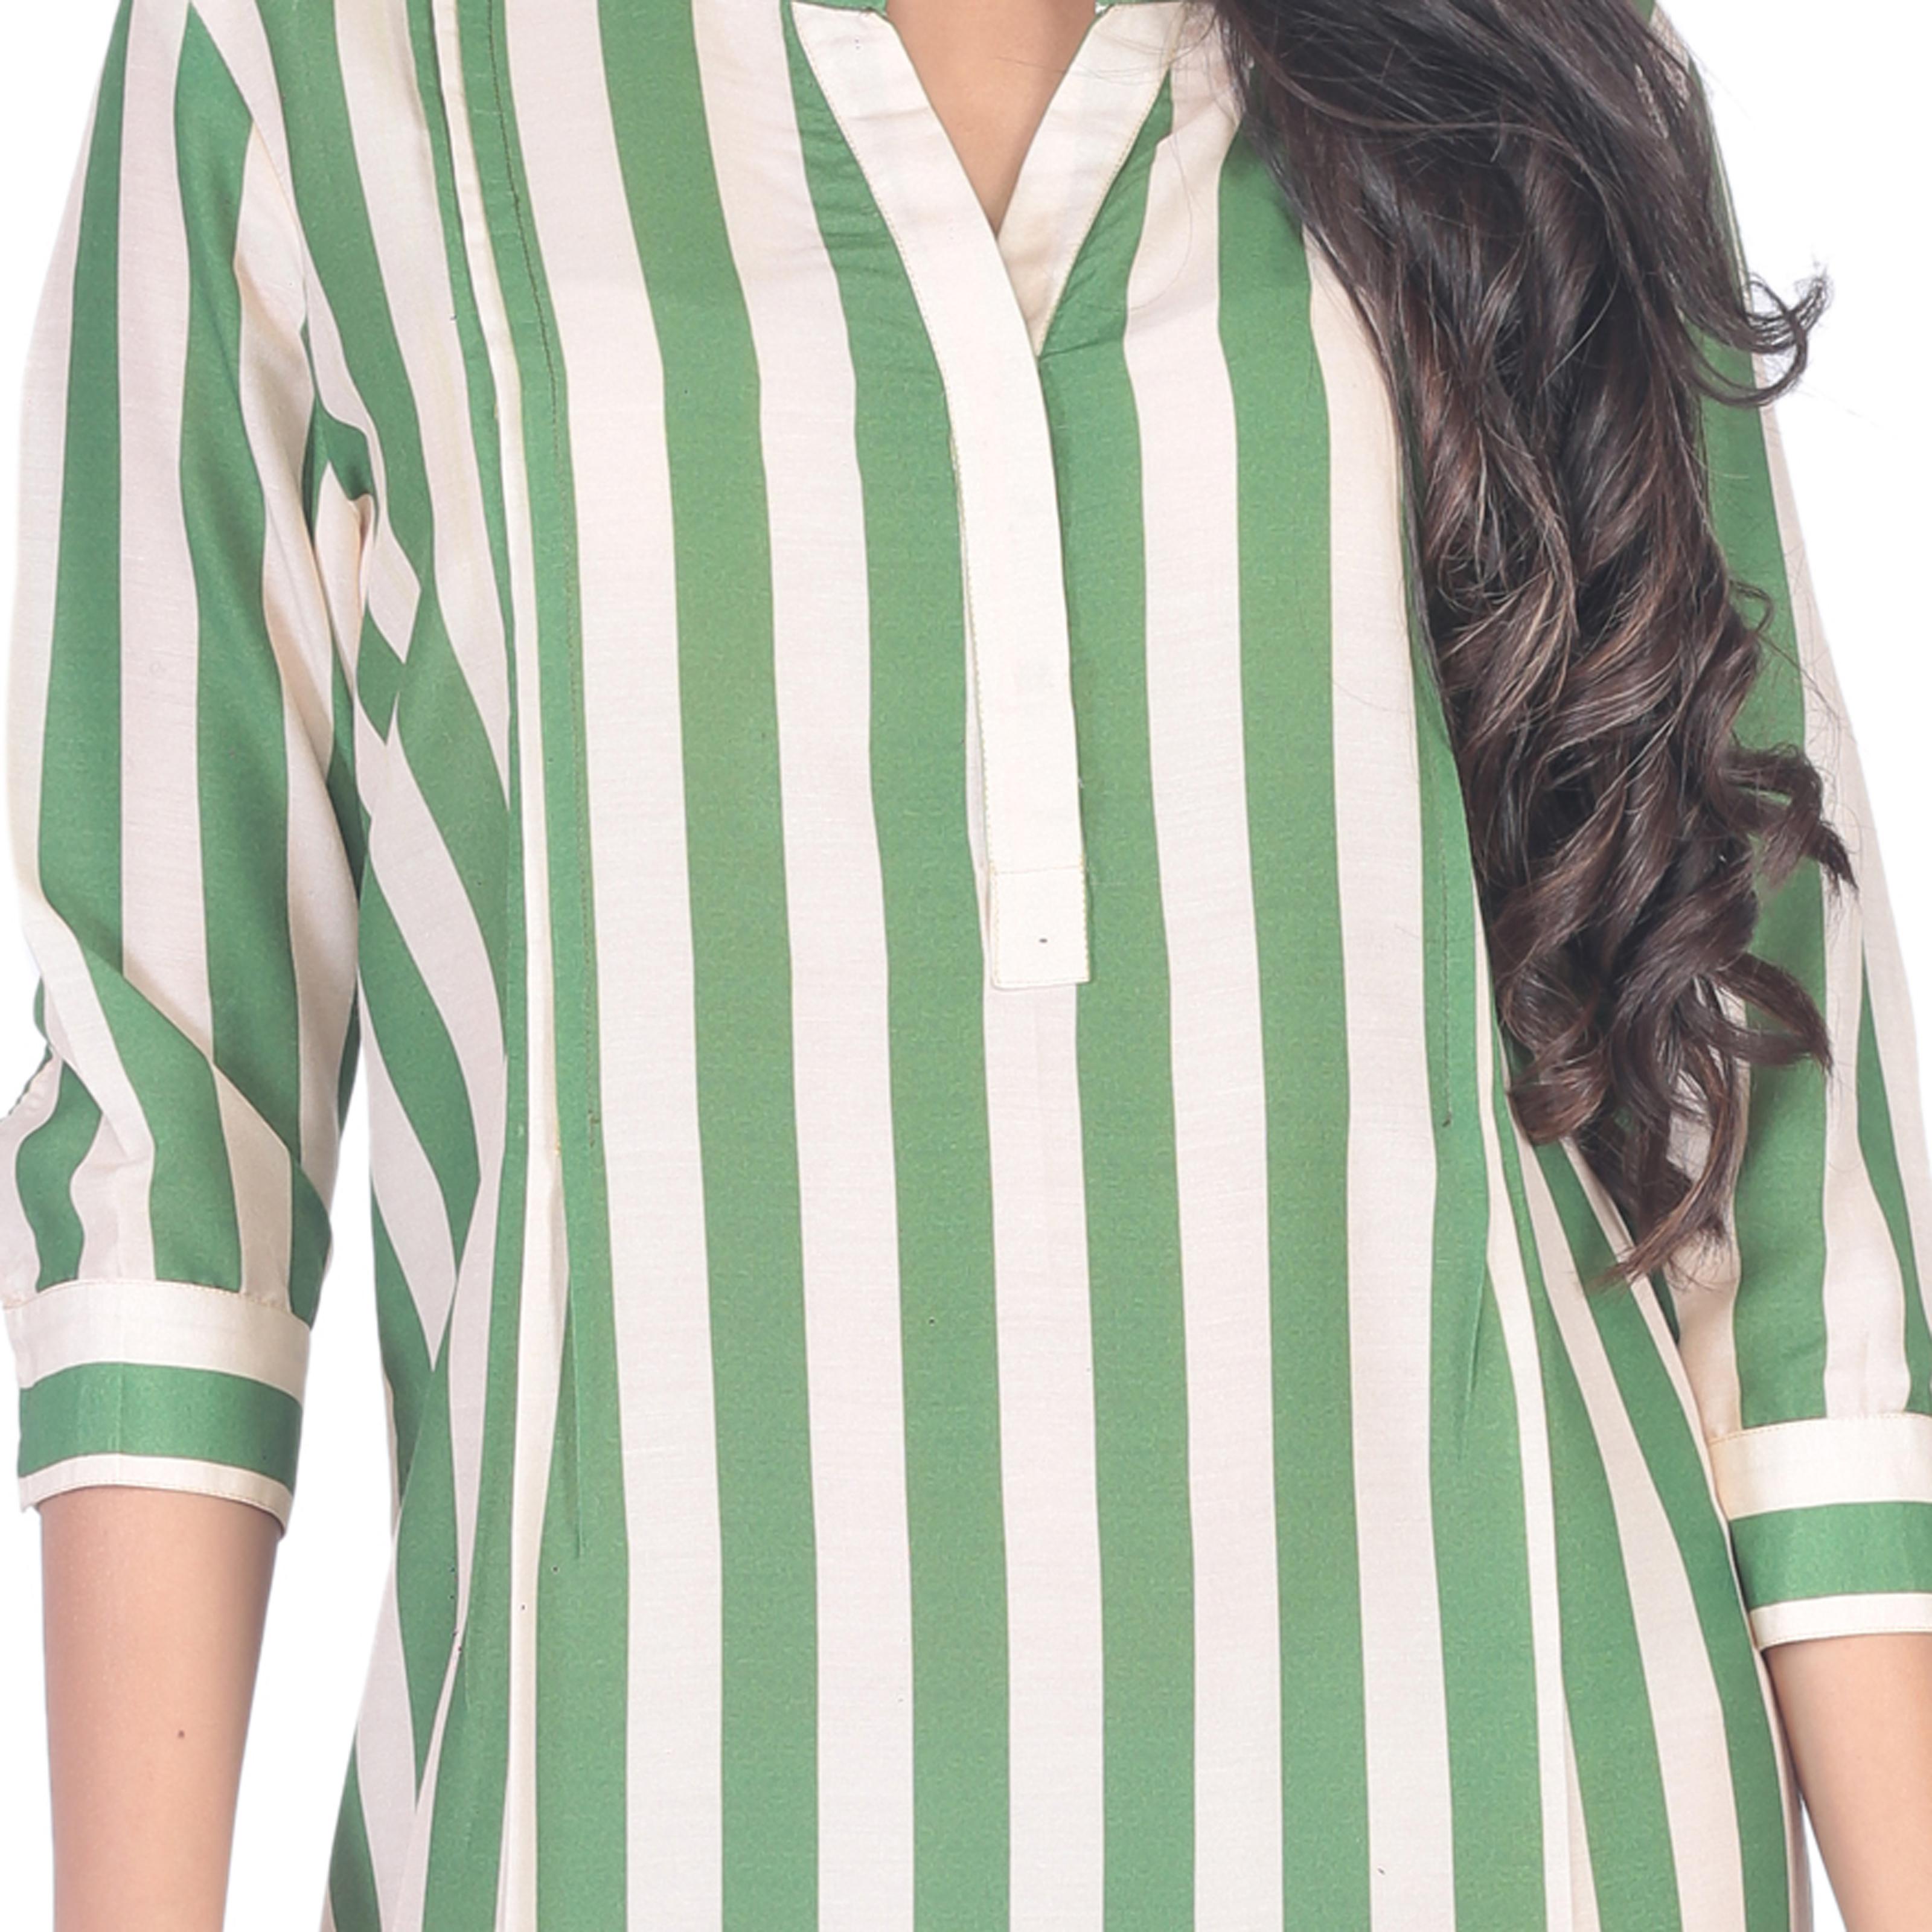 Strip Printed Dress